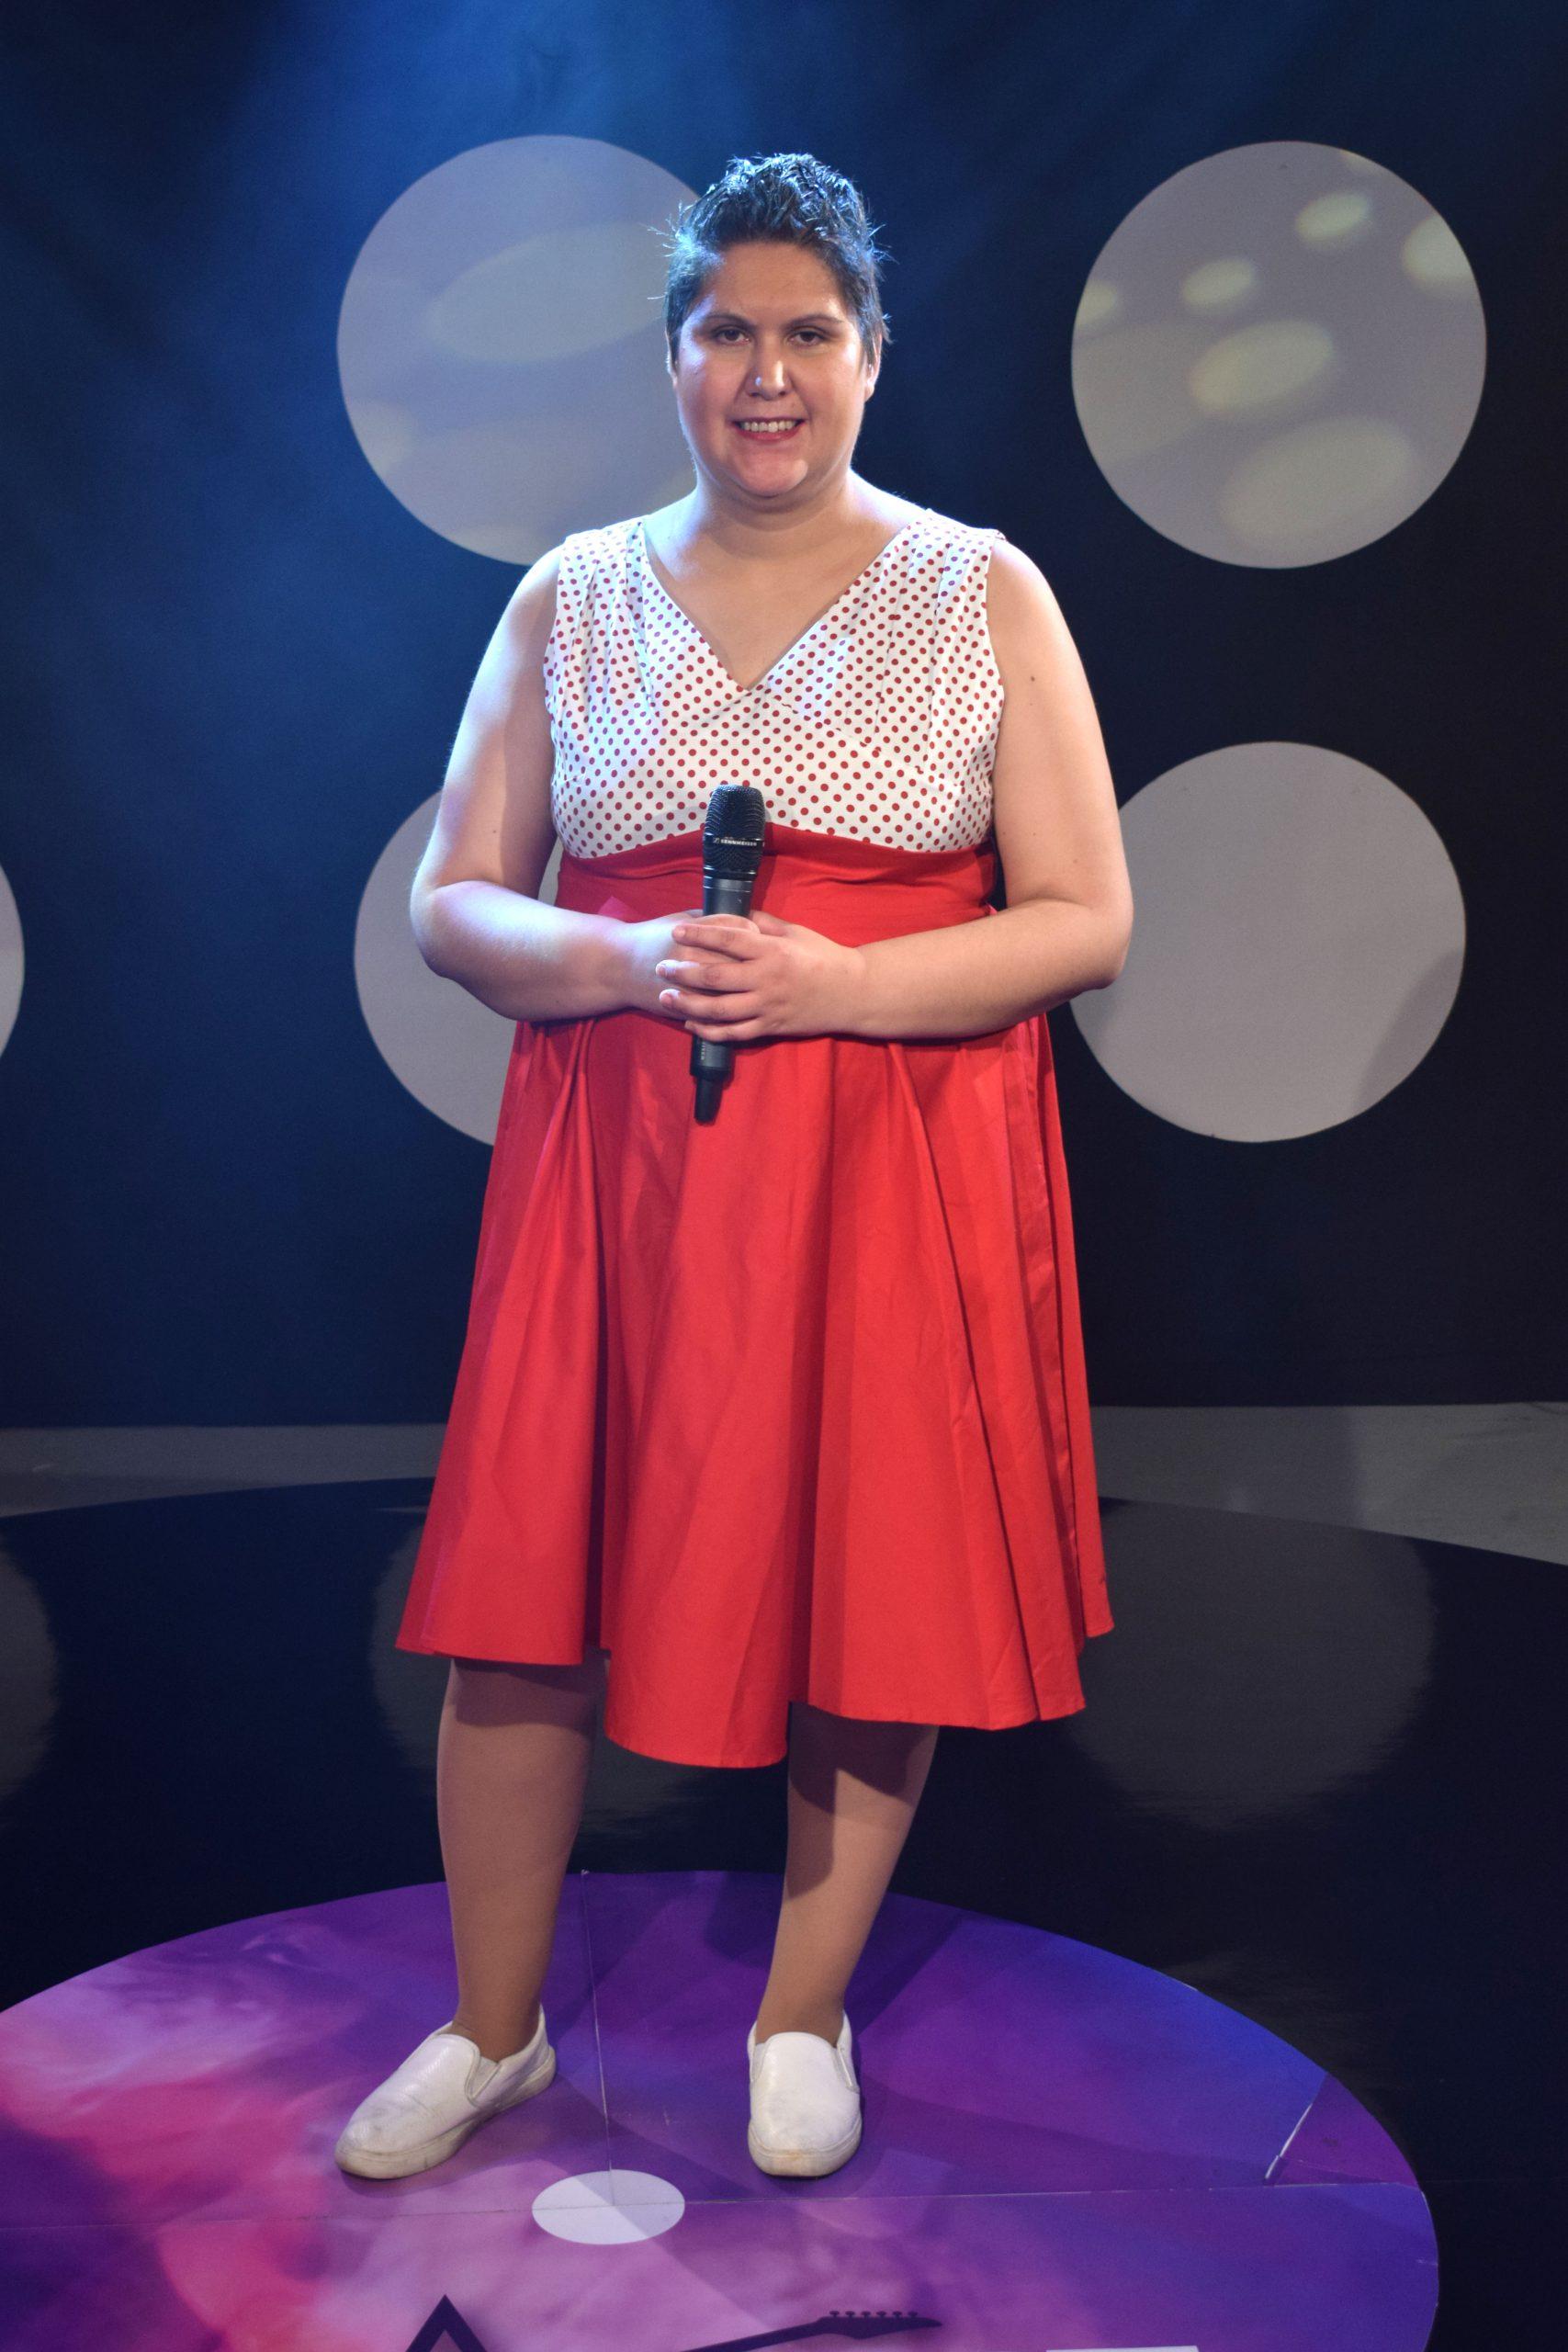 Juanita Månsson